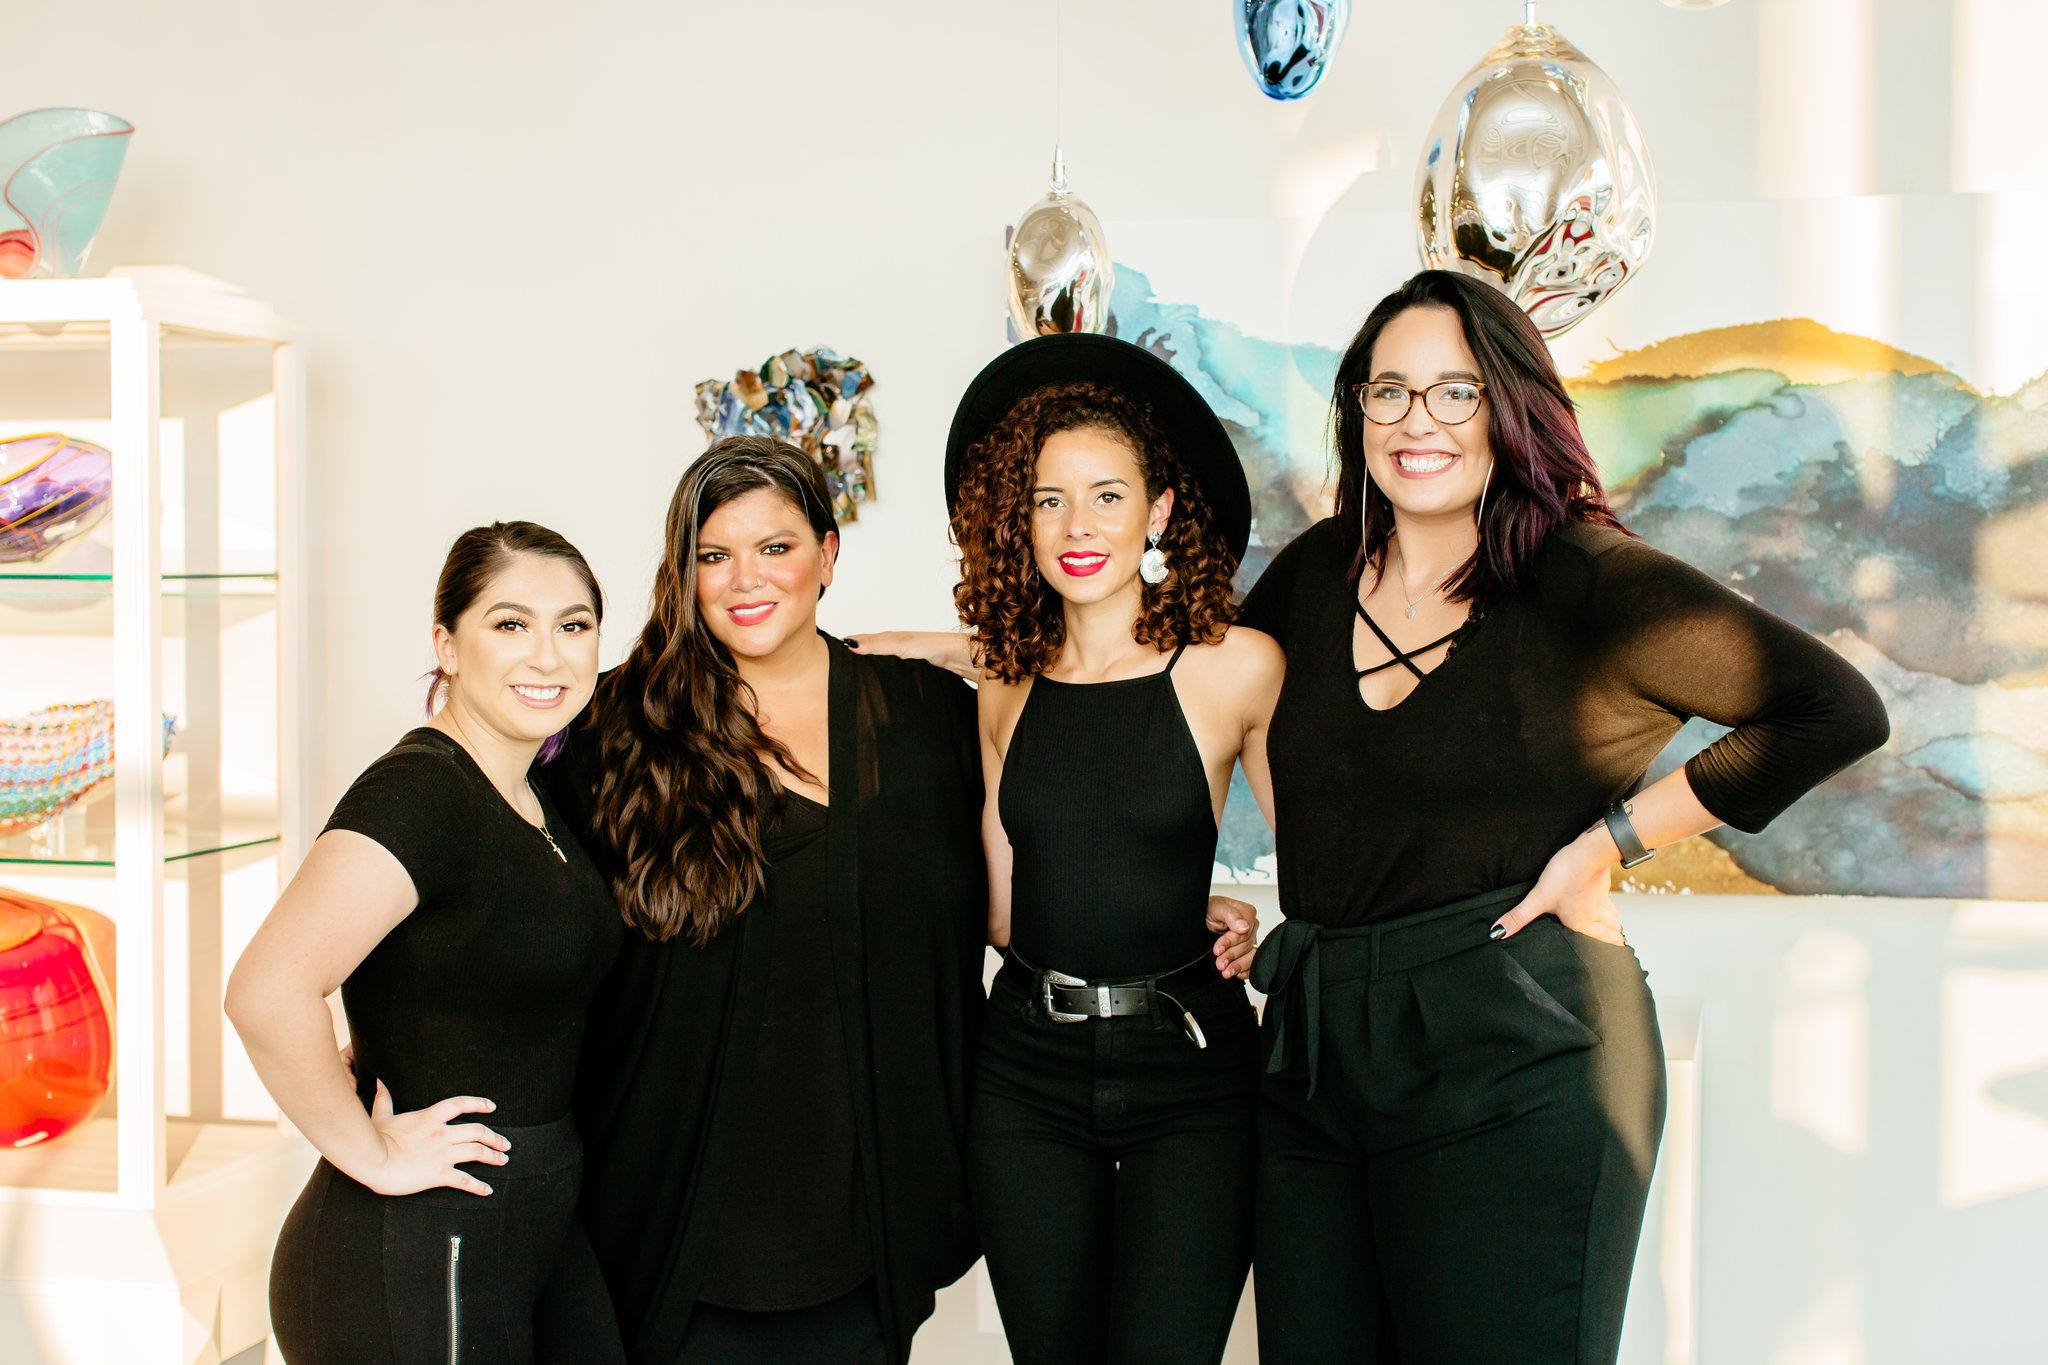 Alexa-Vossler-Photo_Dallas-Event-Photographer_Brite-Bar-Beauty-2018-Lipstick-Launch-Party-172.jpg